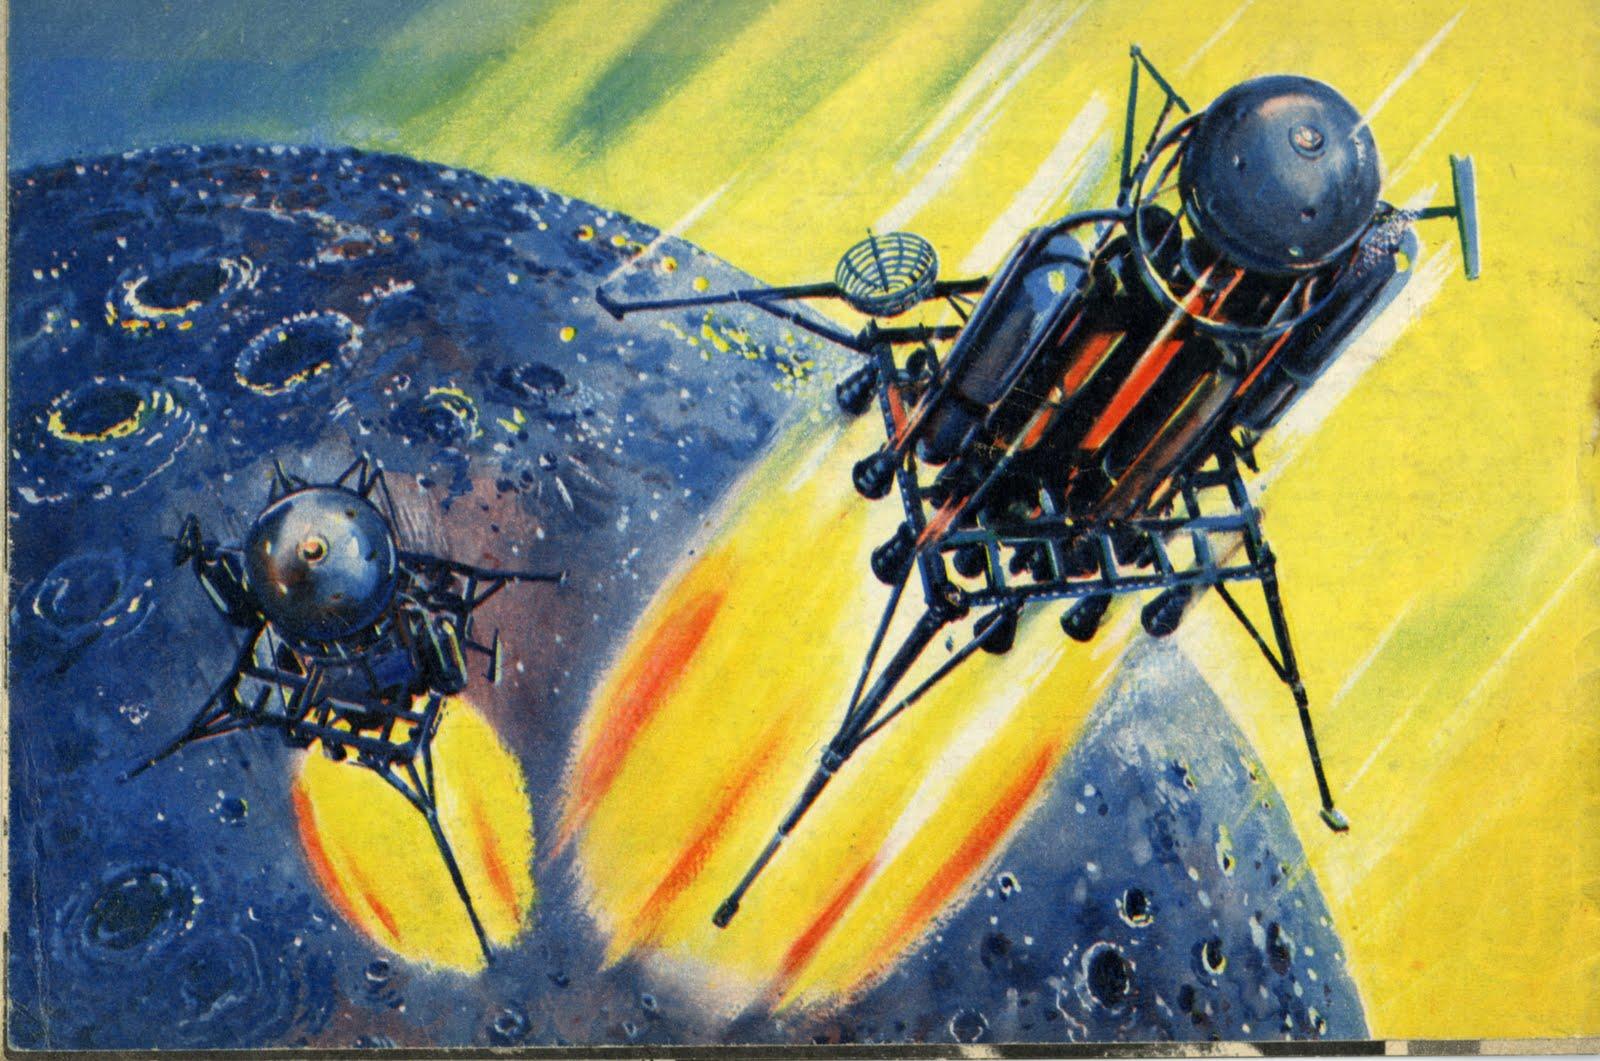 Dreams of Space - Books and Ephemera: Wonders of Space ...